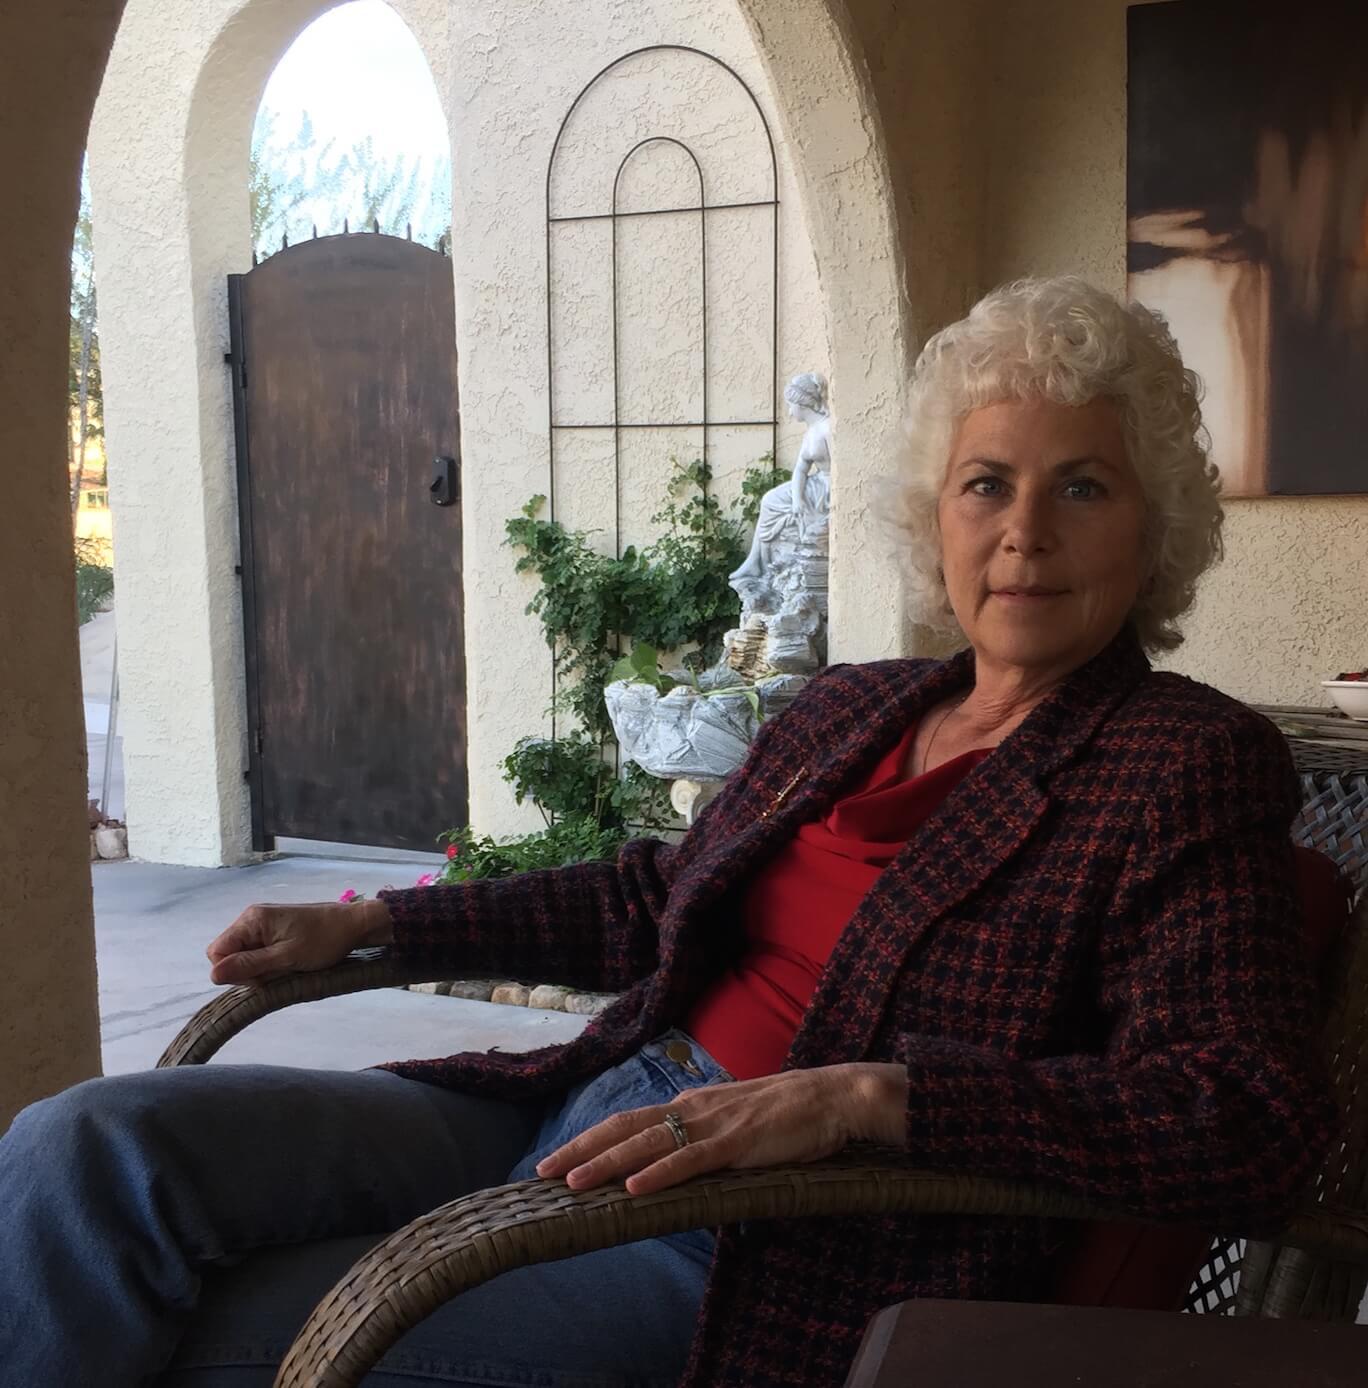 Barb Eagan